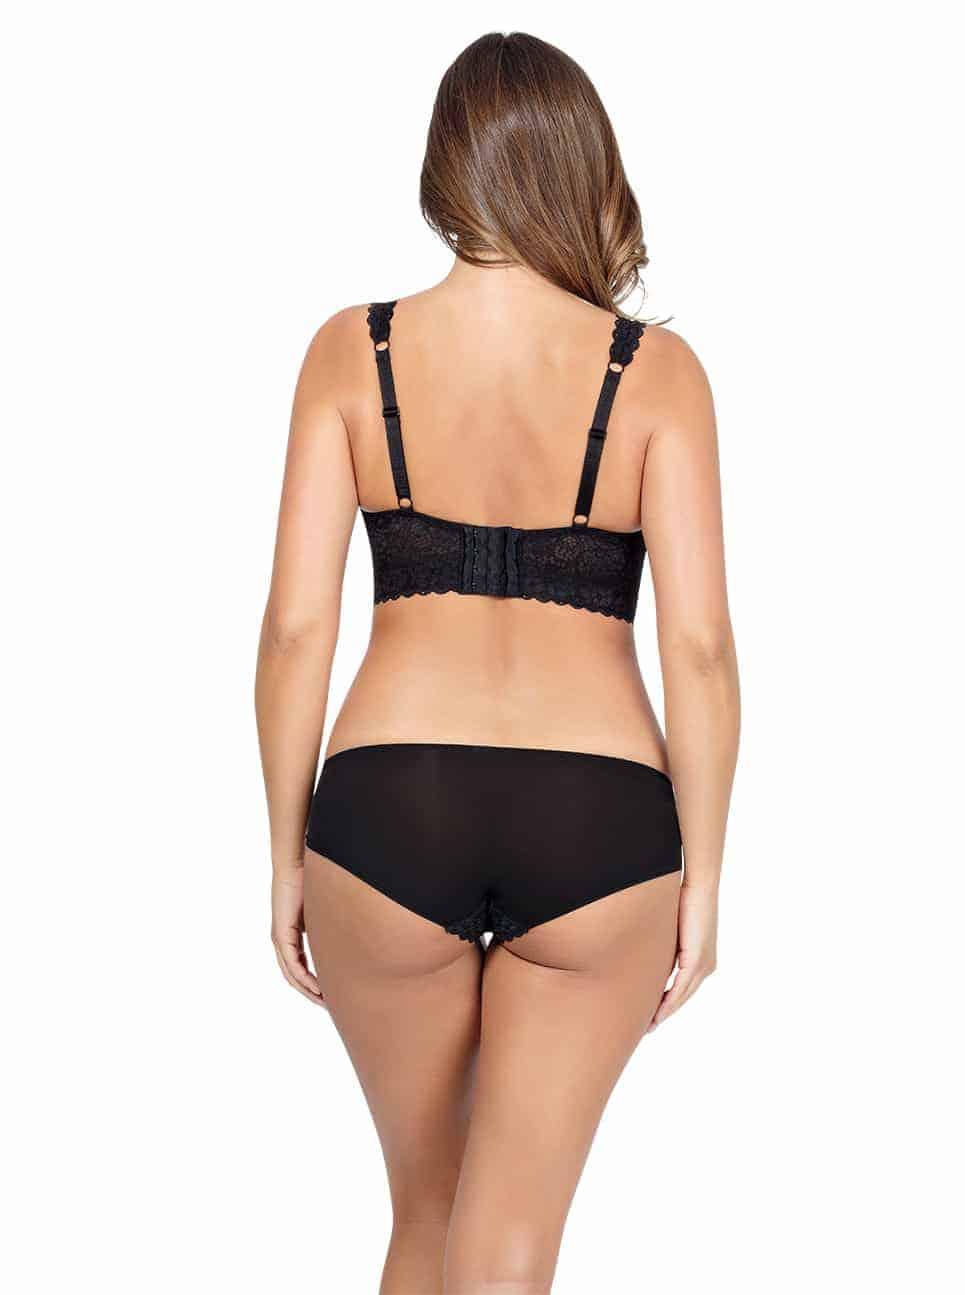 Базовое белье PARFAIT_Adriana_LaceBraletteP5482_BikiniP5483_Black_Back